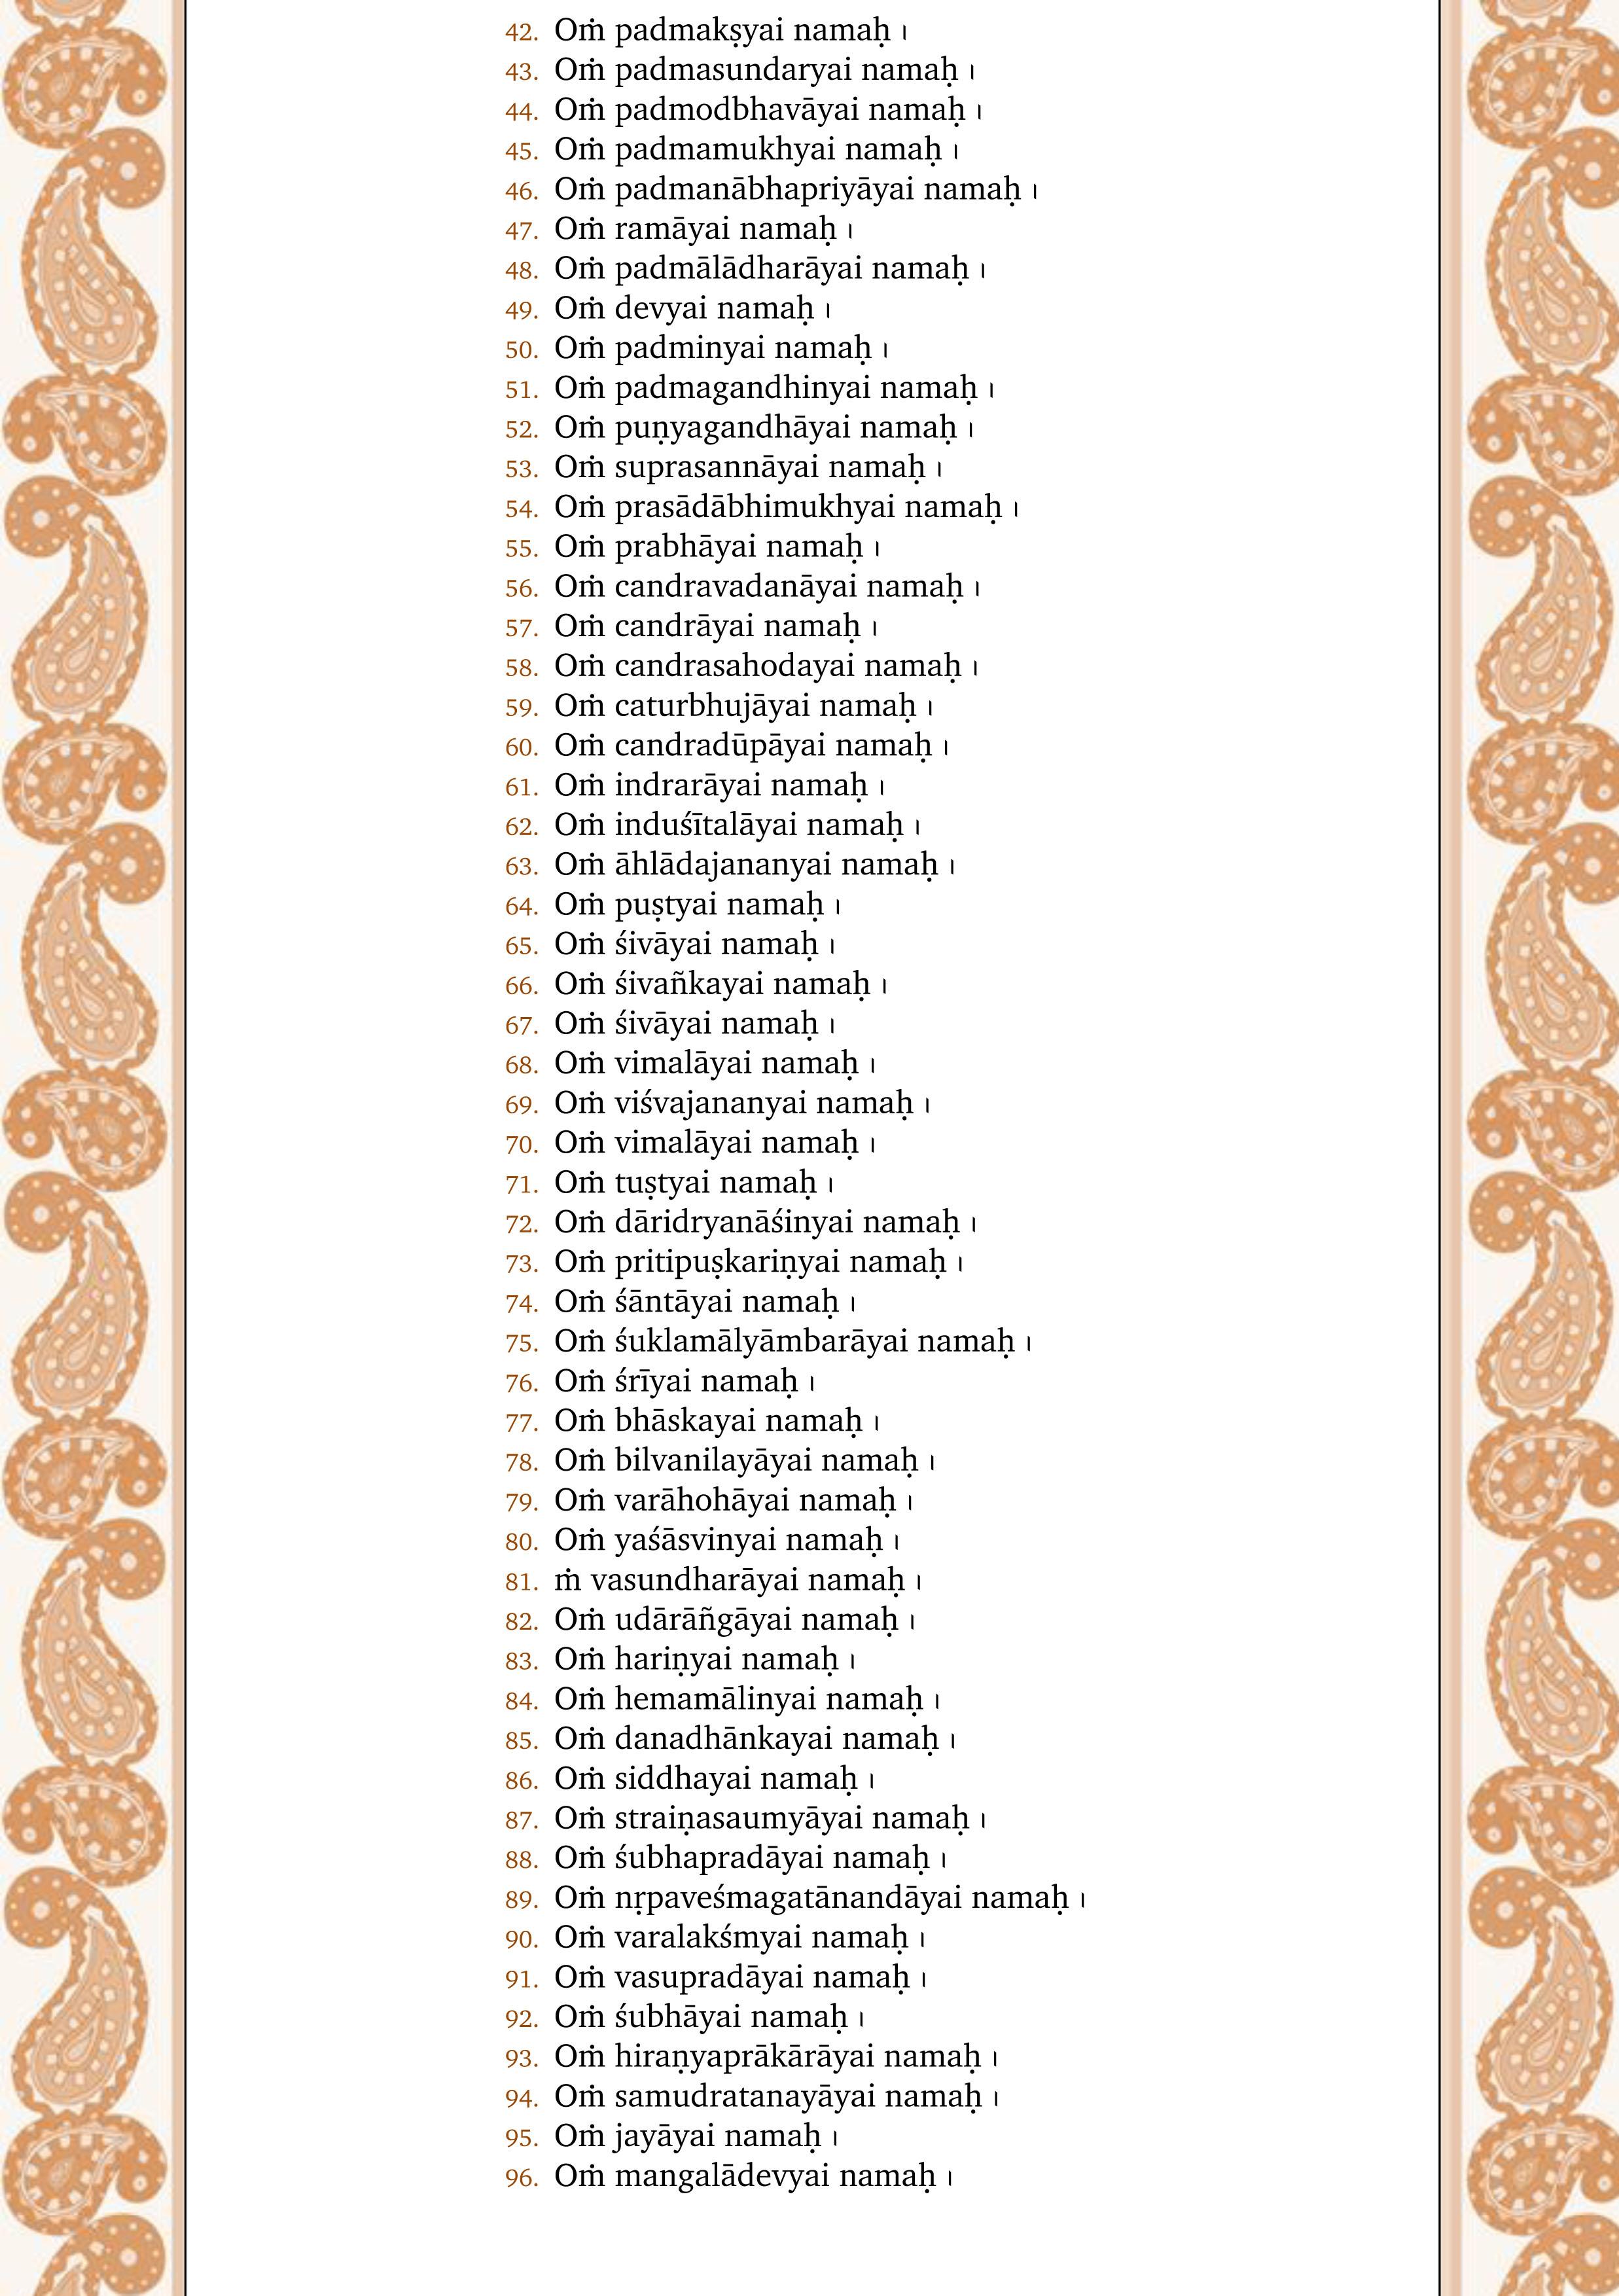 108 noms Lakshmi-2